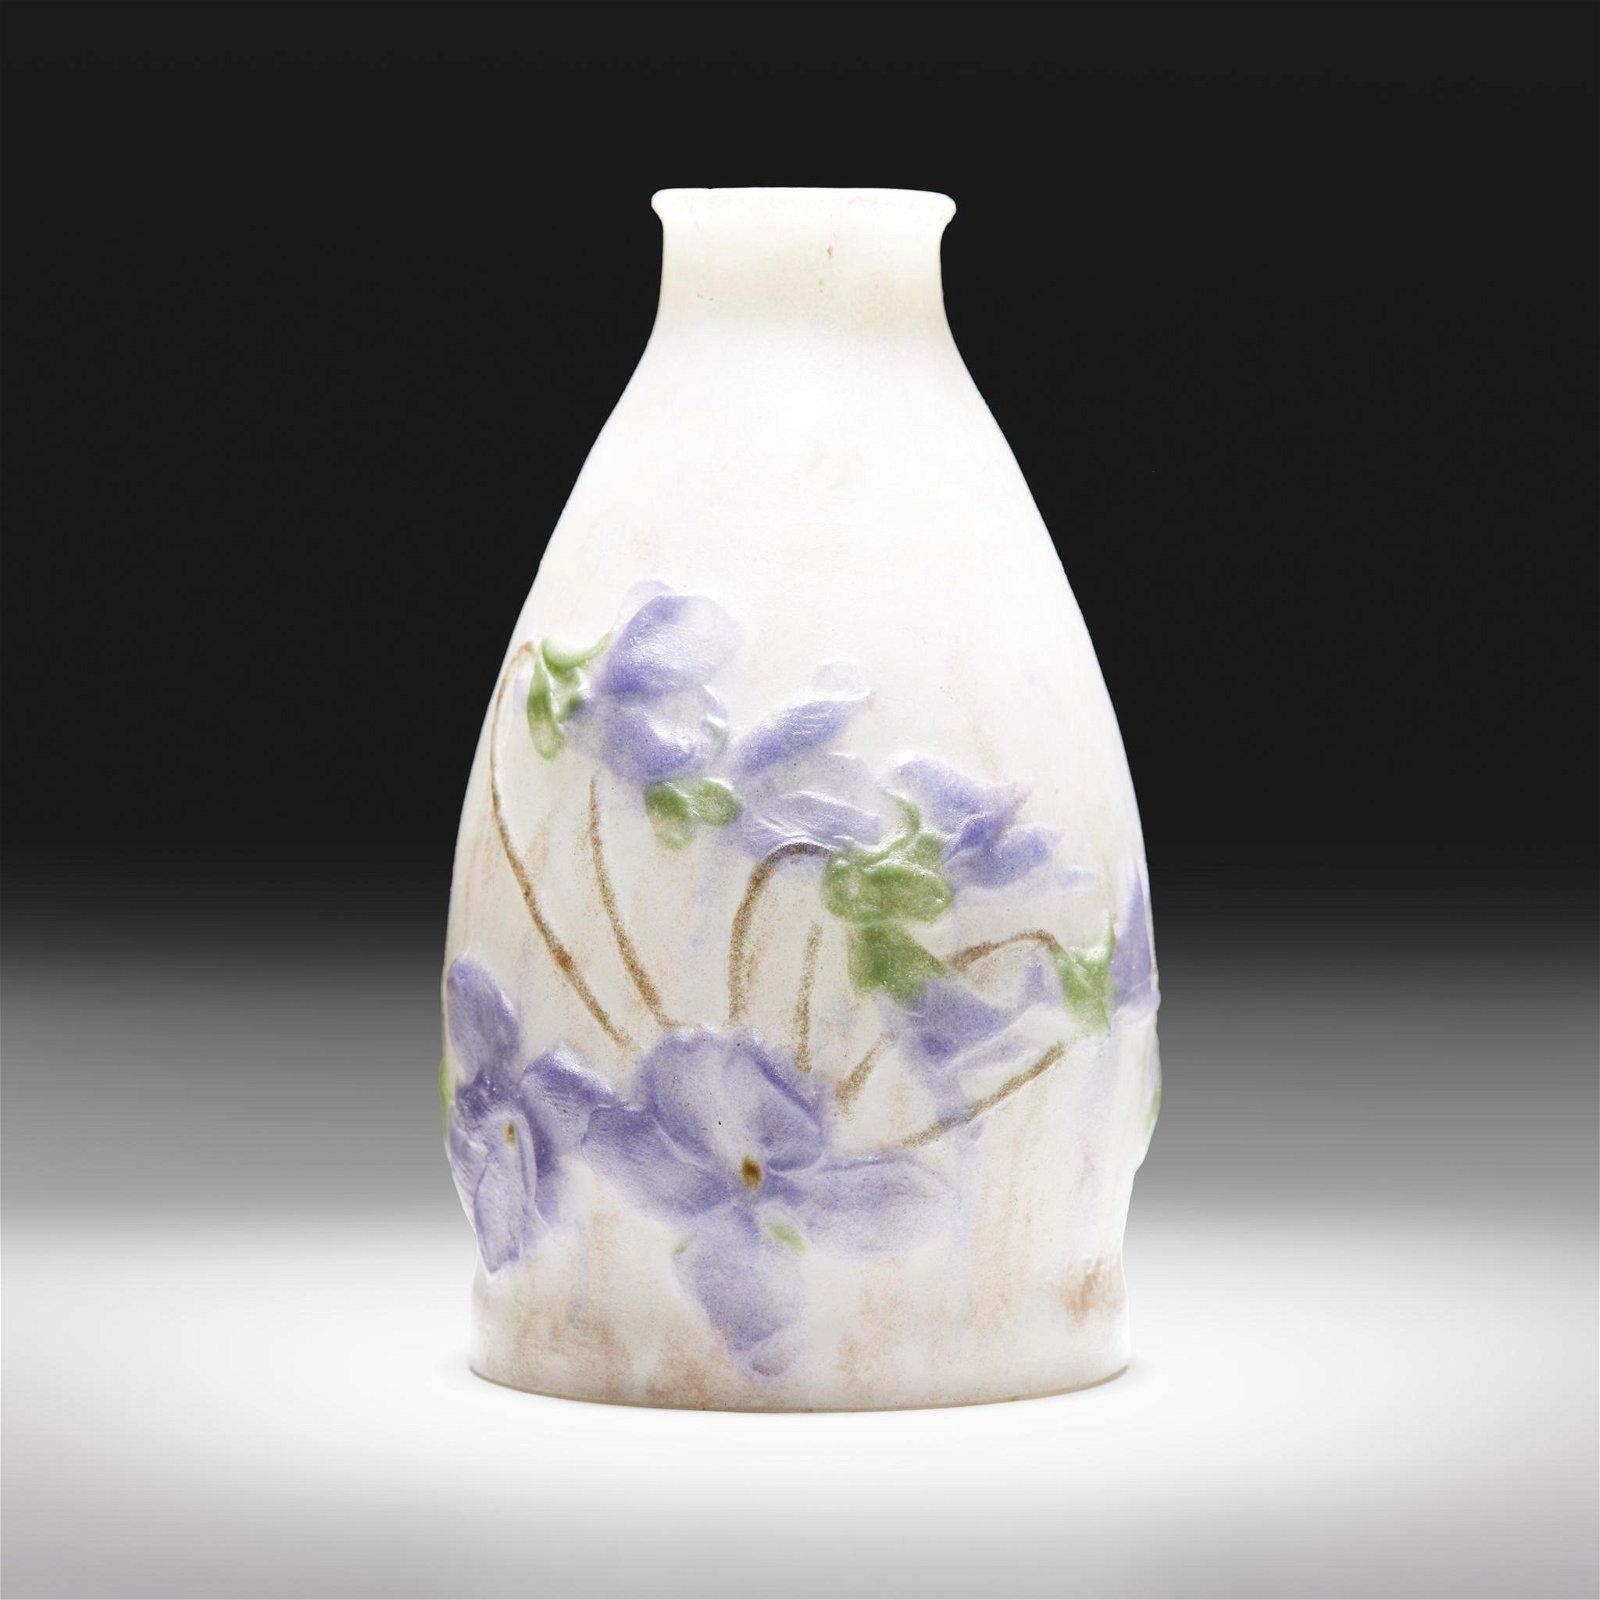 Gabriel Argy-Rousseau (French, 1885-1953), A Small Vase